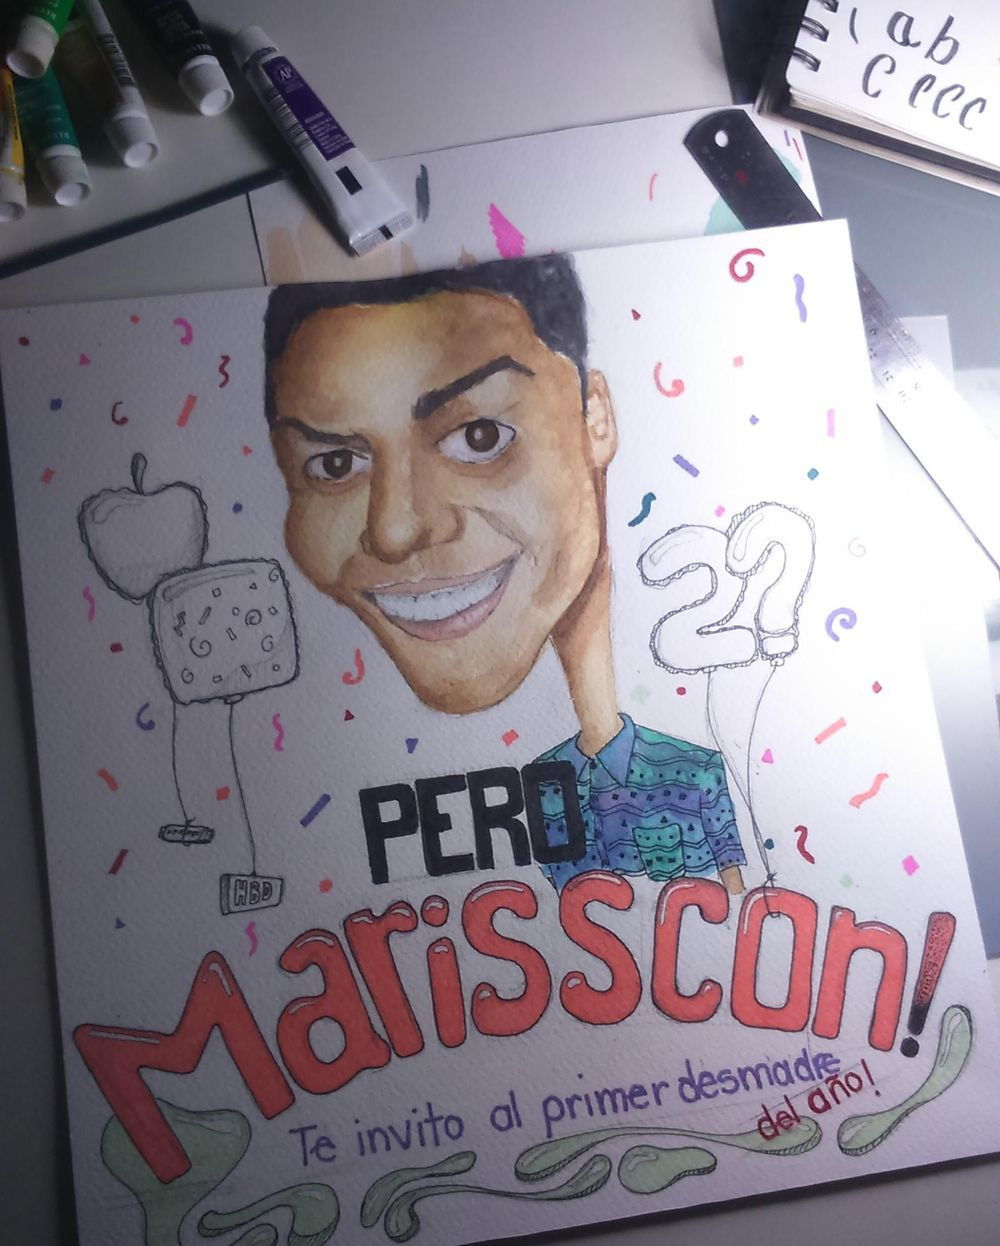 """PERO MARISSCON""  - image 4 - student project"